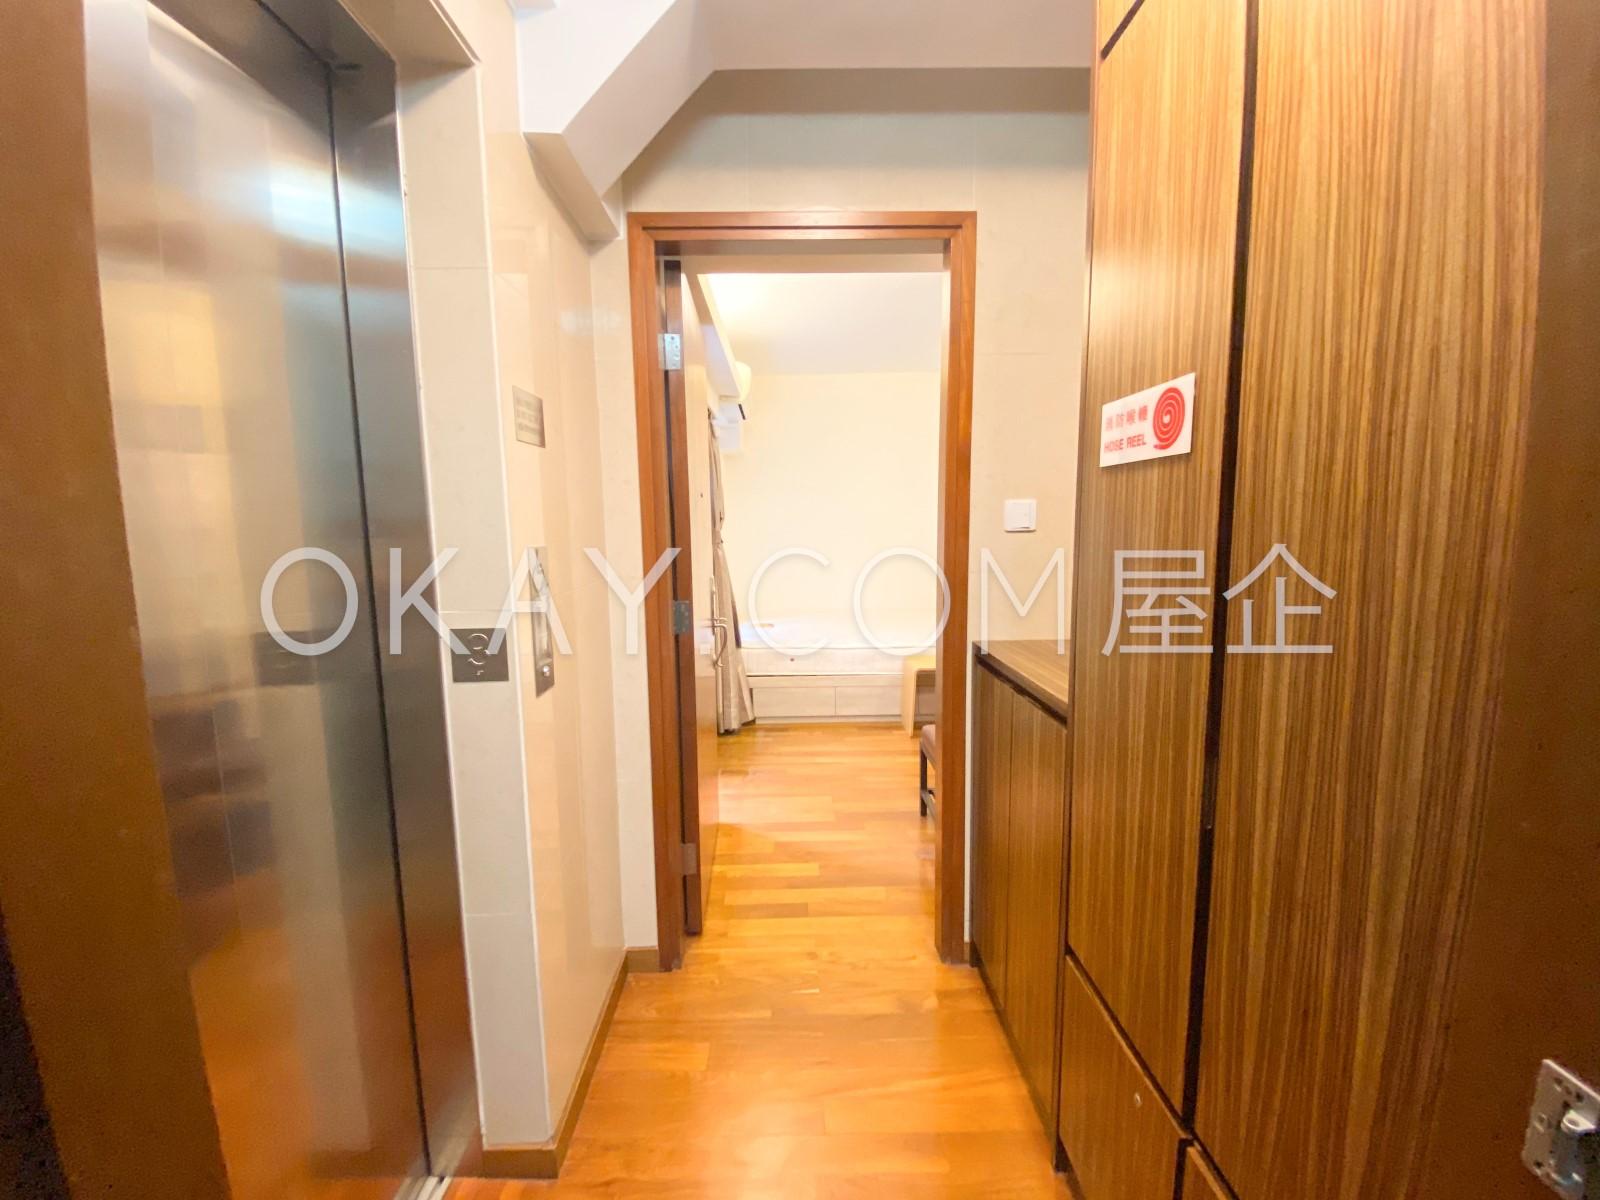 one unit per floor entrance